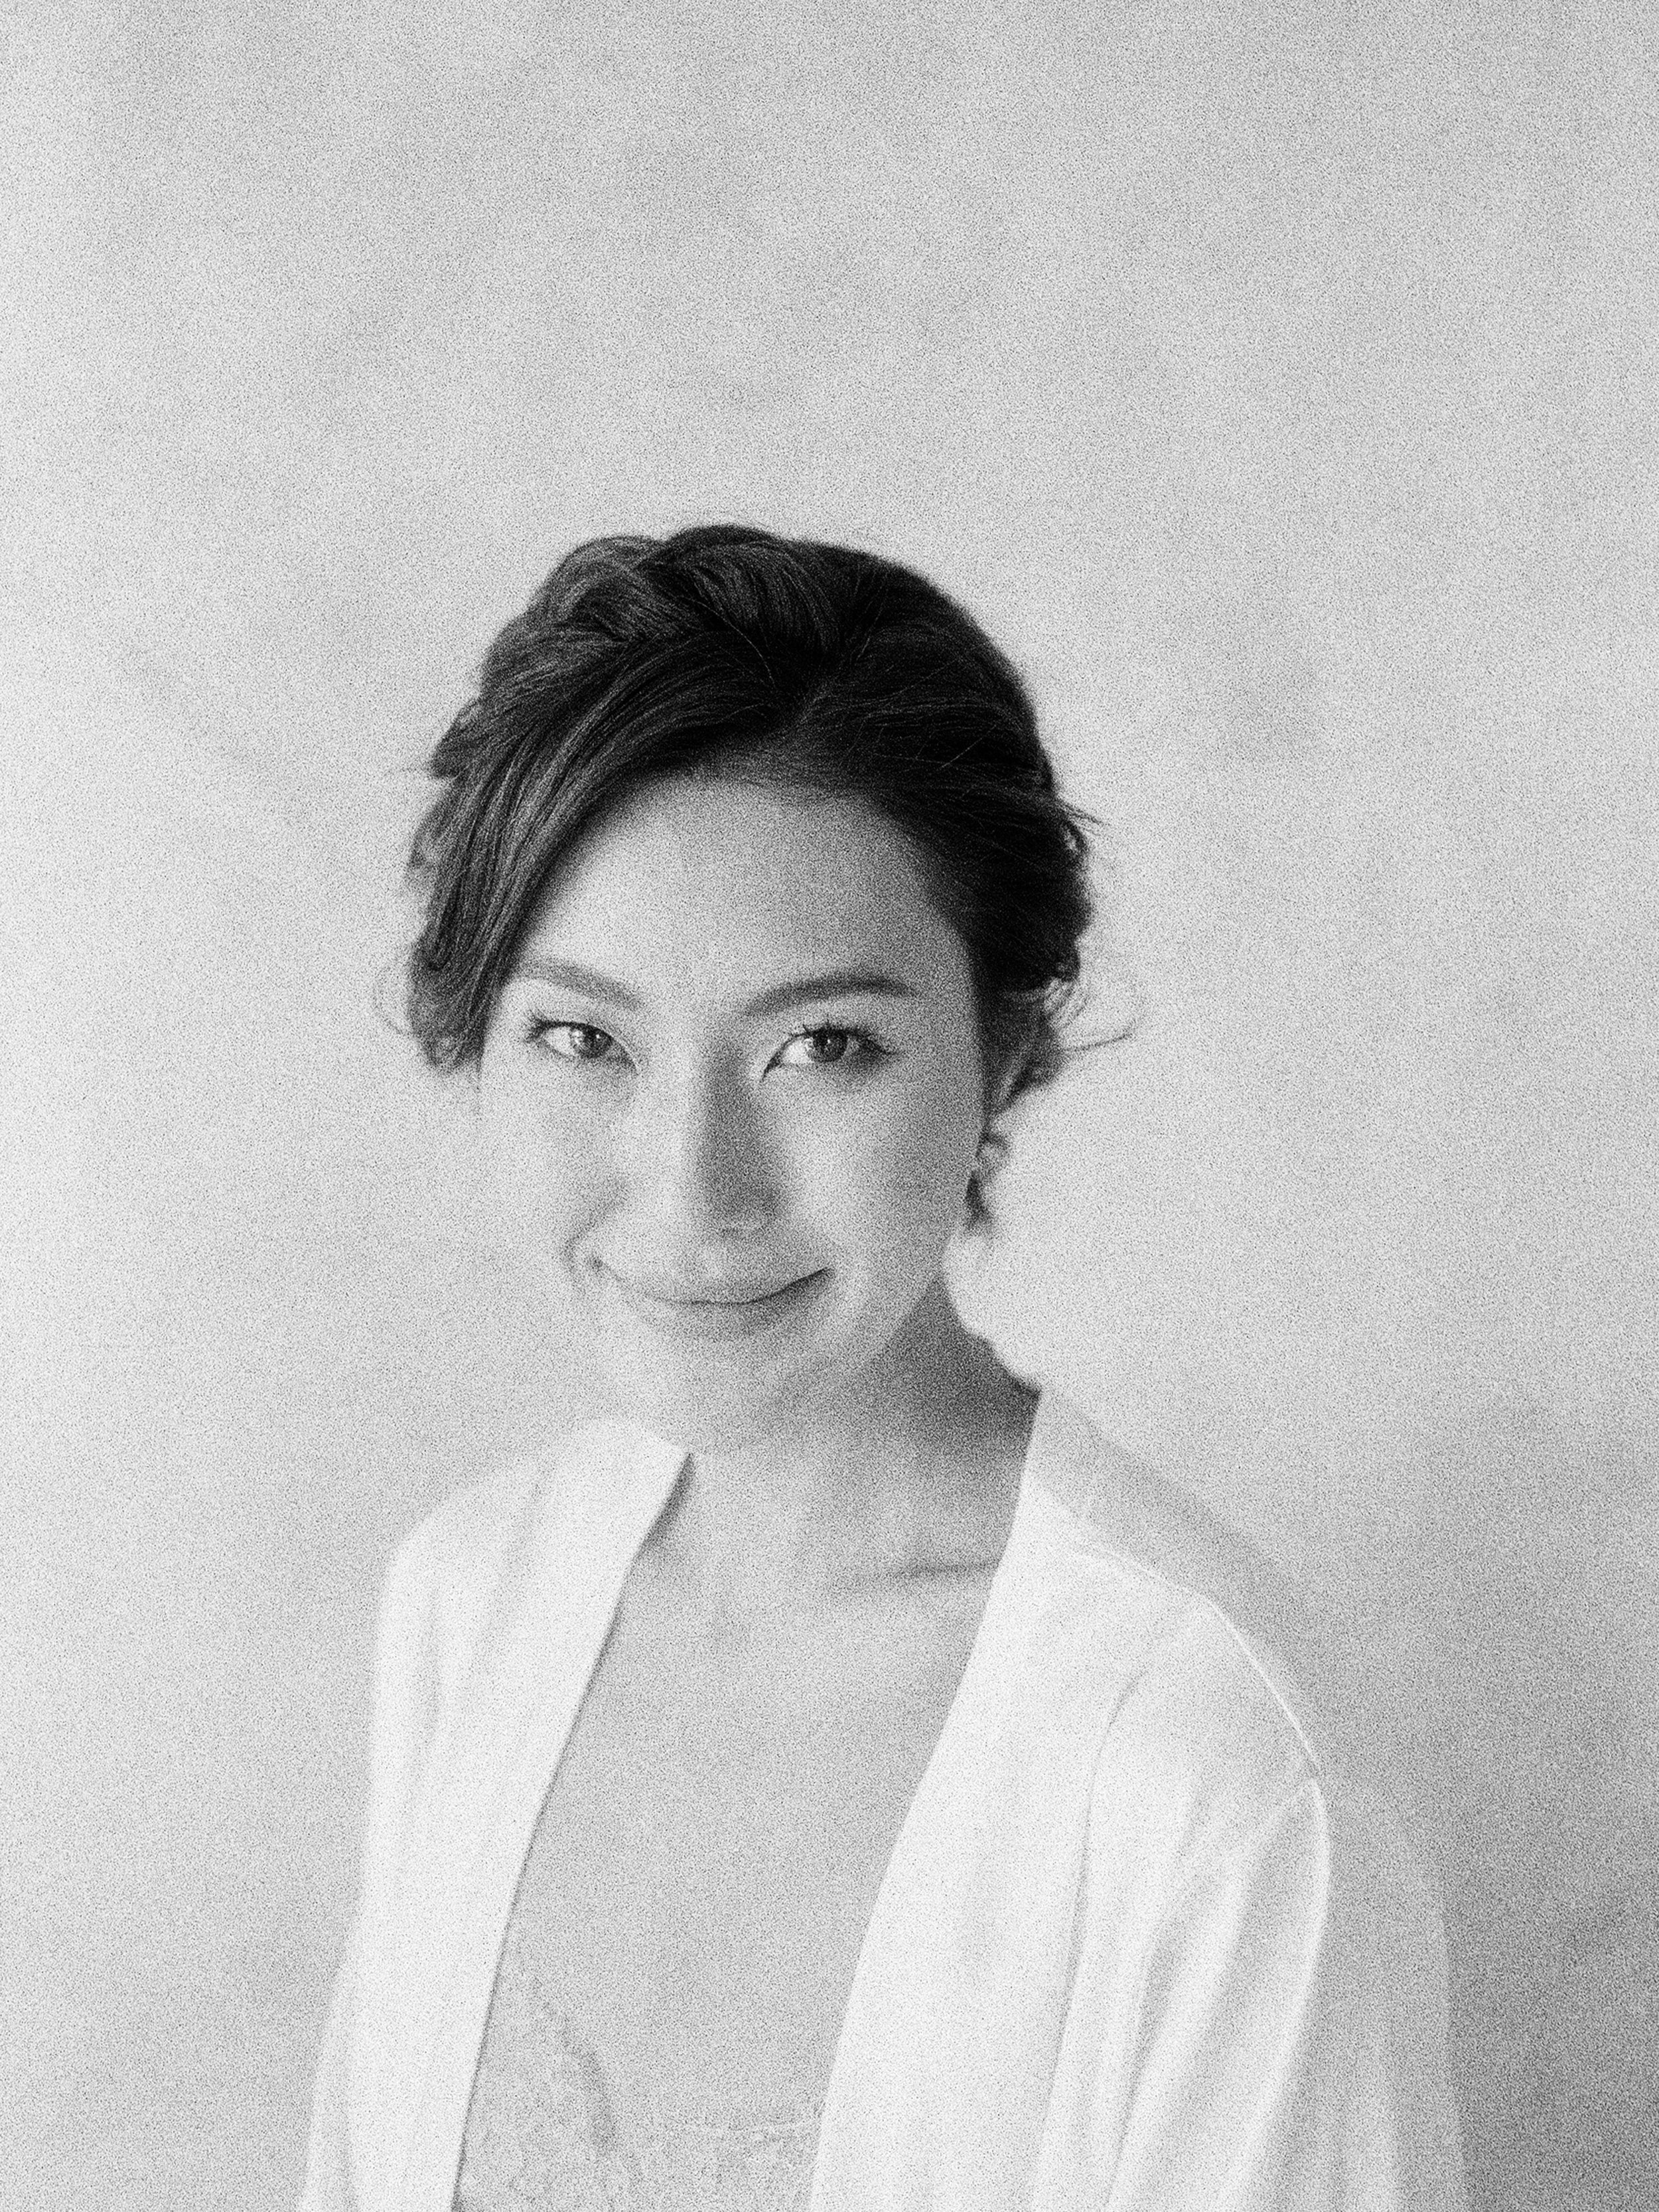 KS-Editorial-116-Jen-Huang-000008310021.jpg